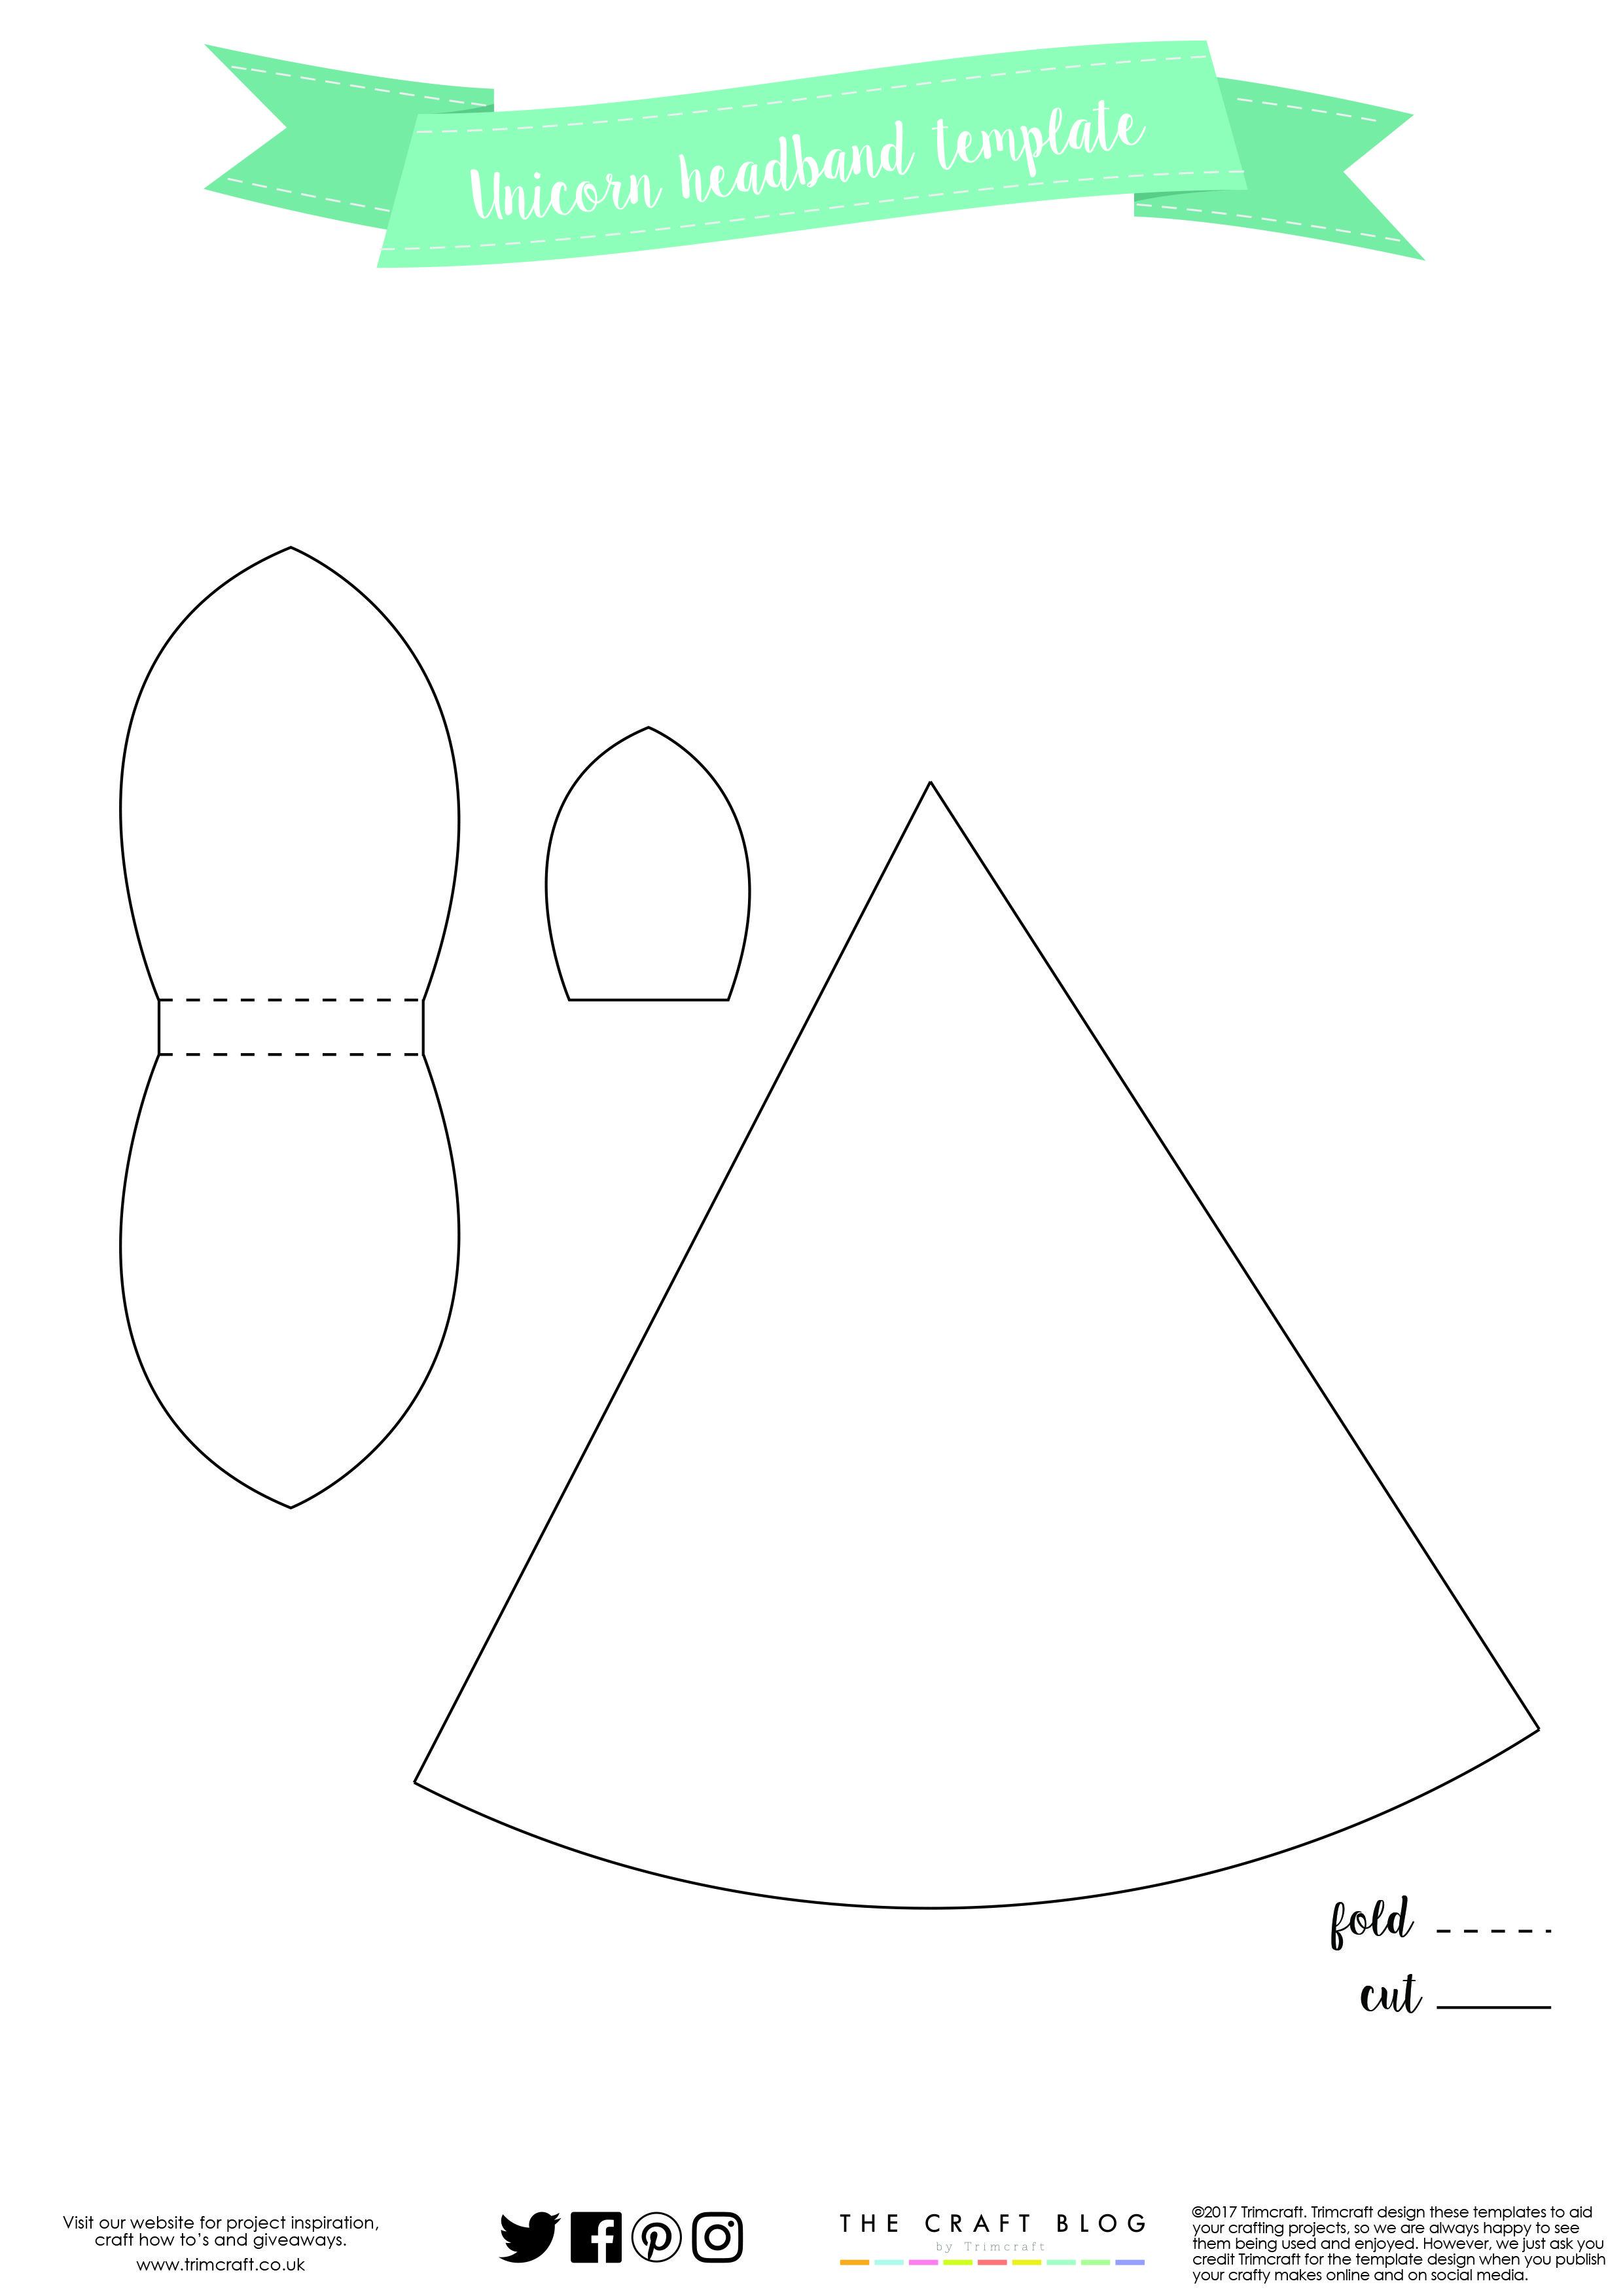 diy no sew unicorn headband tutorial with free printable template